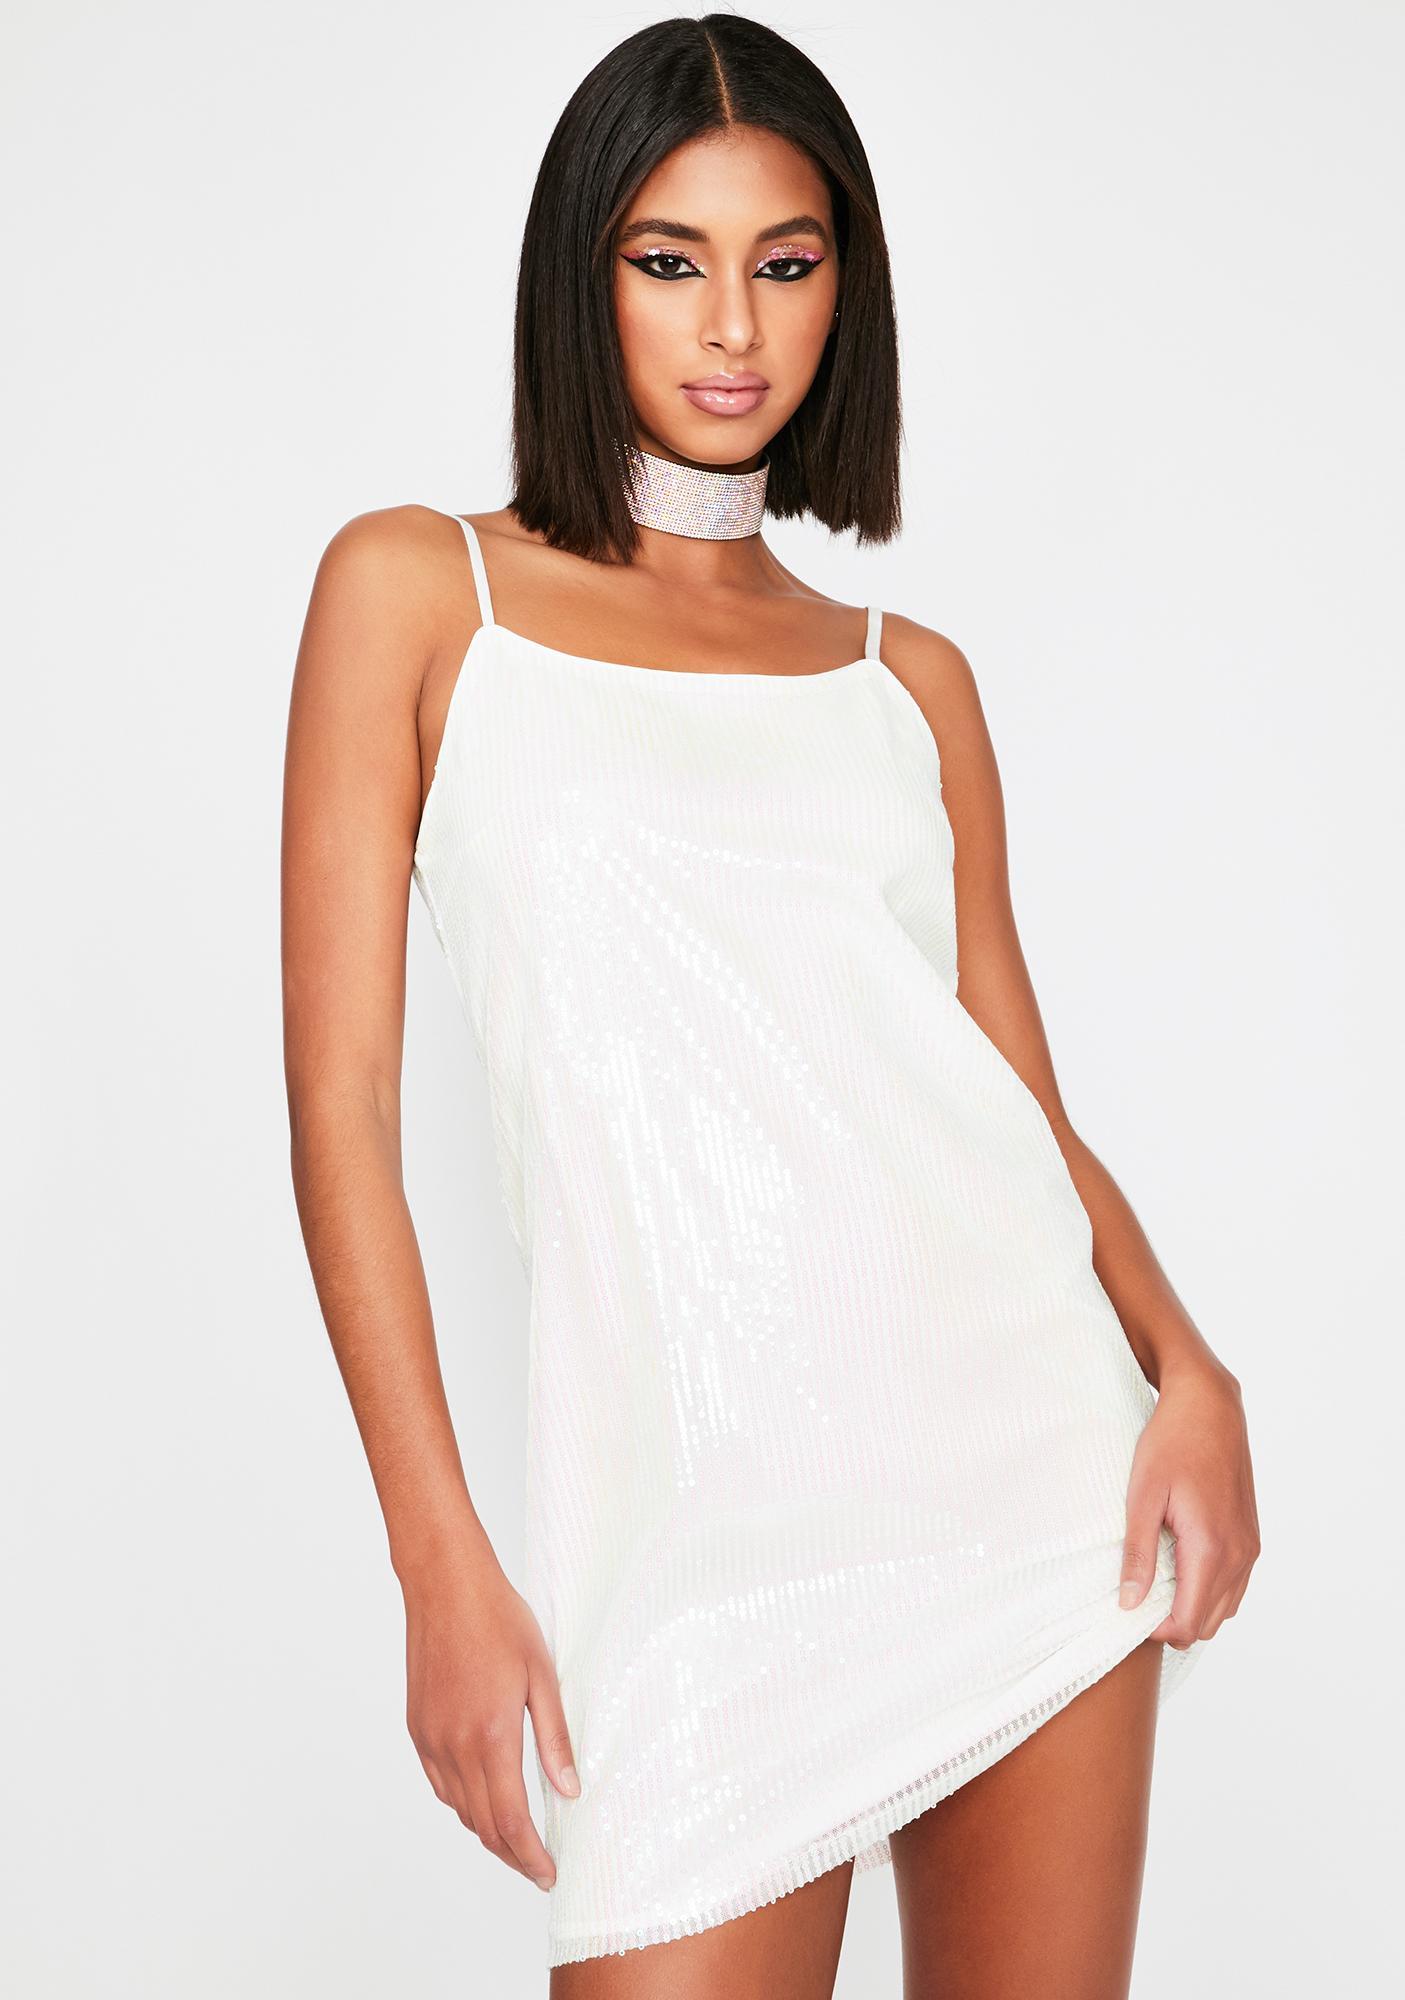 Universal Appeal Slip Dress